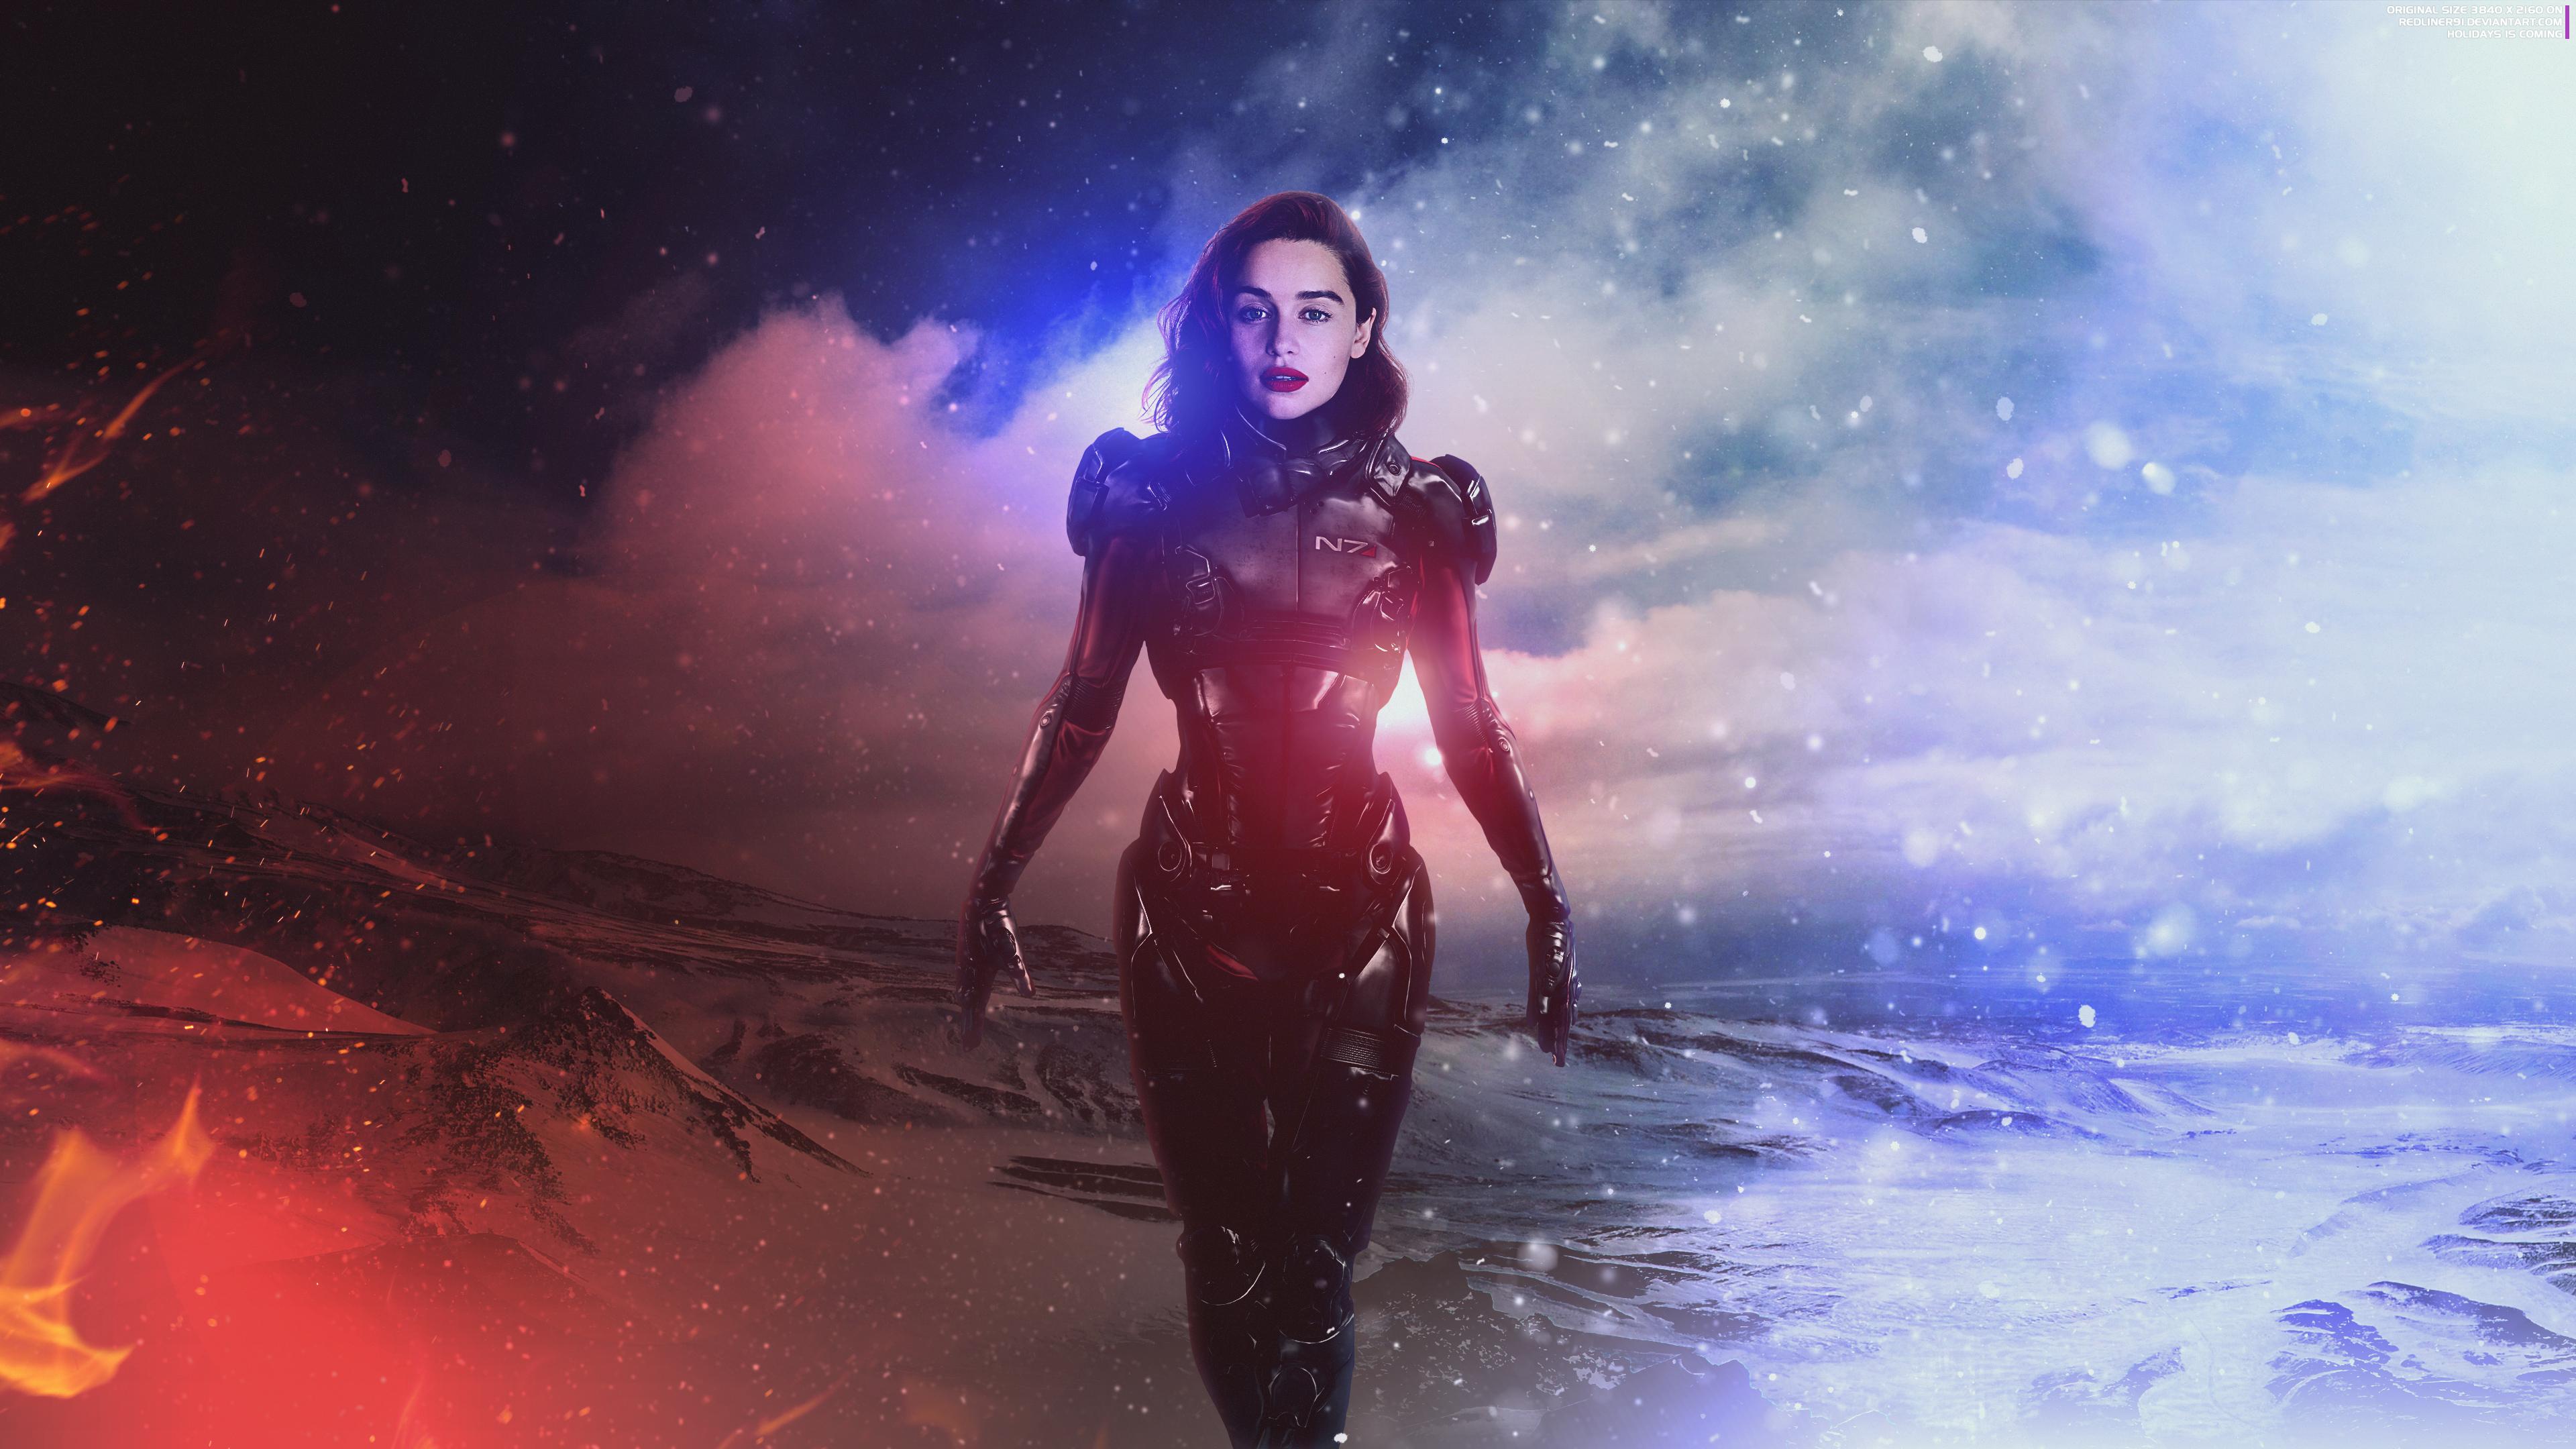 Emilia Clarke Mass Effect Andromeda 4k Hd Games 4k Wallpapers